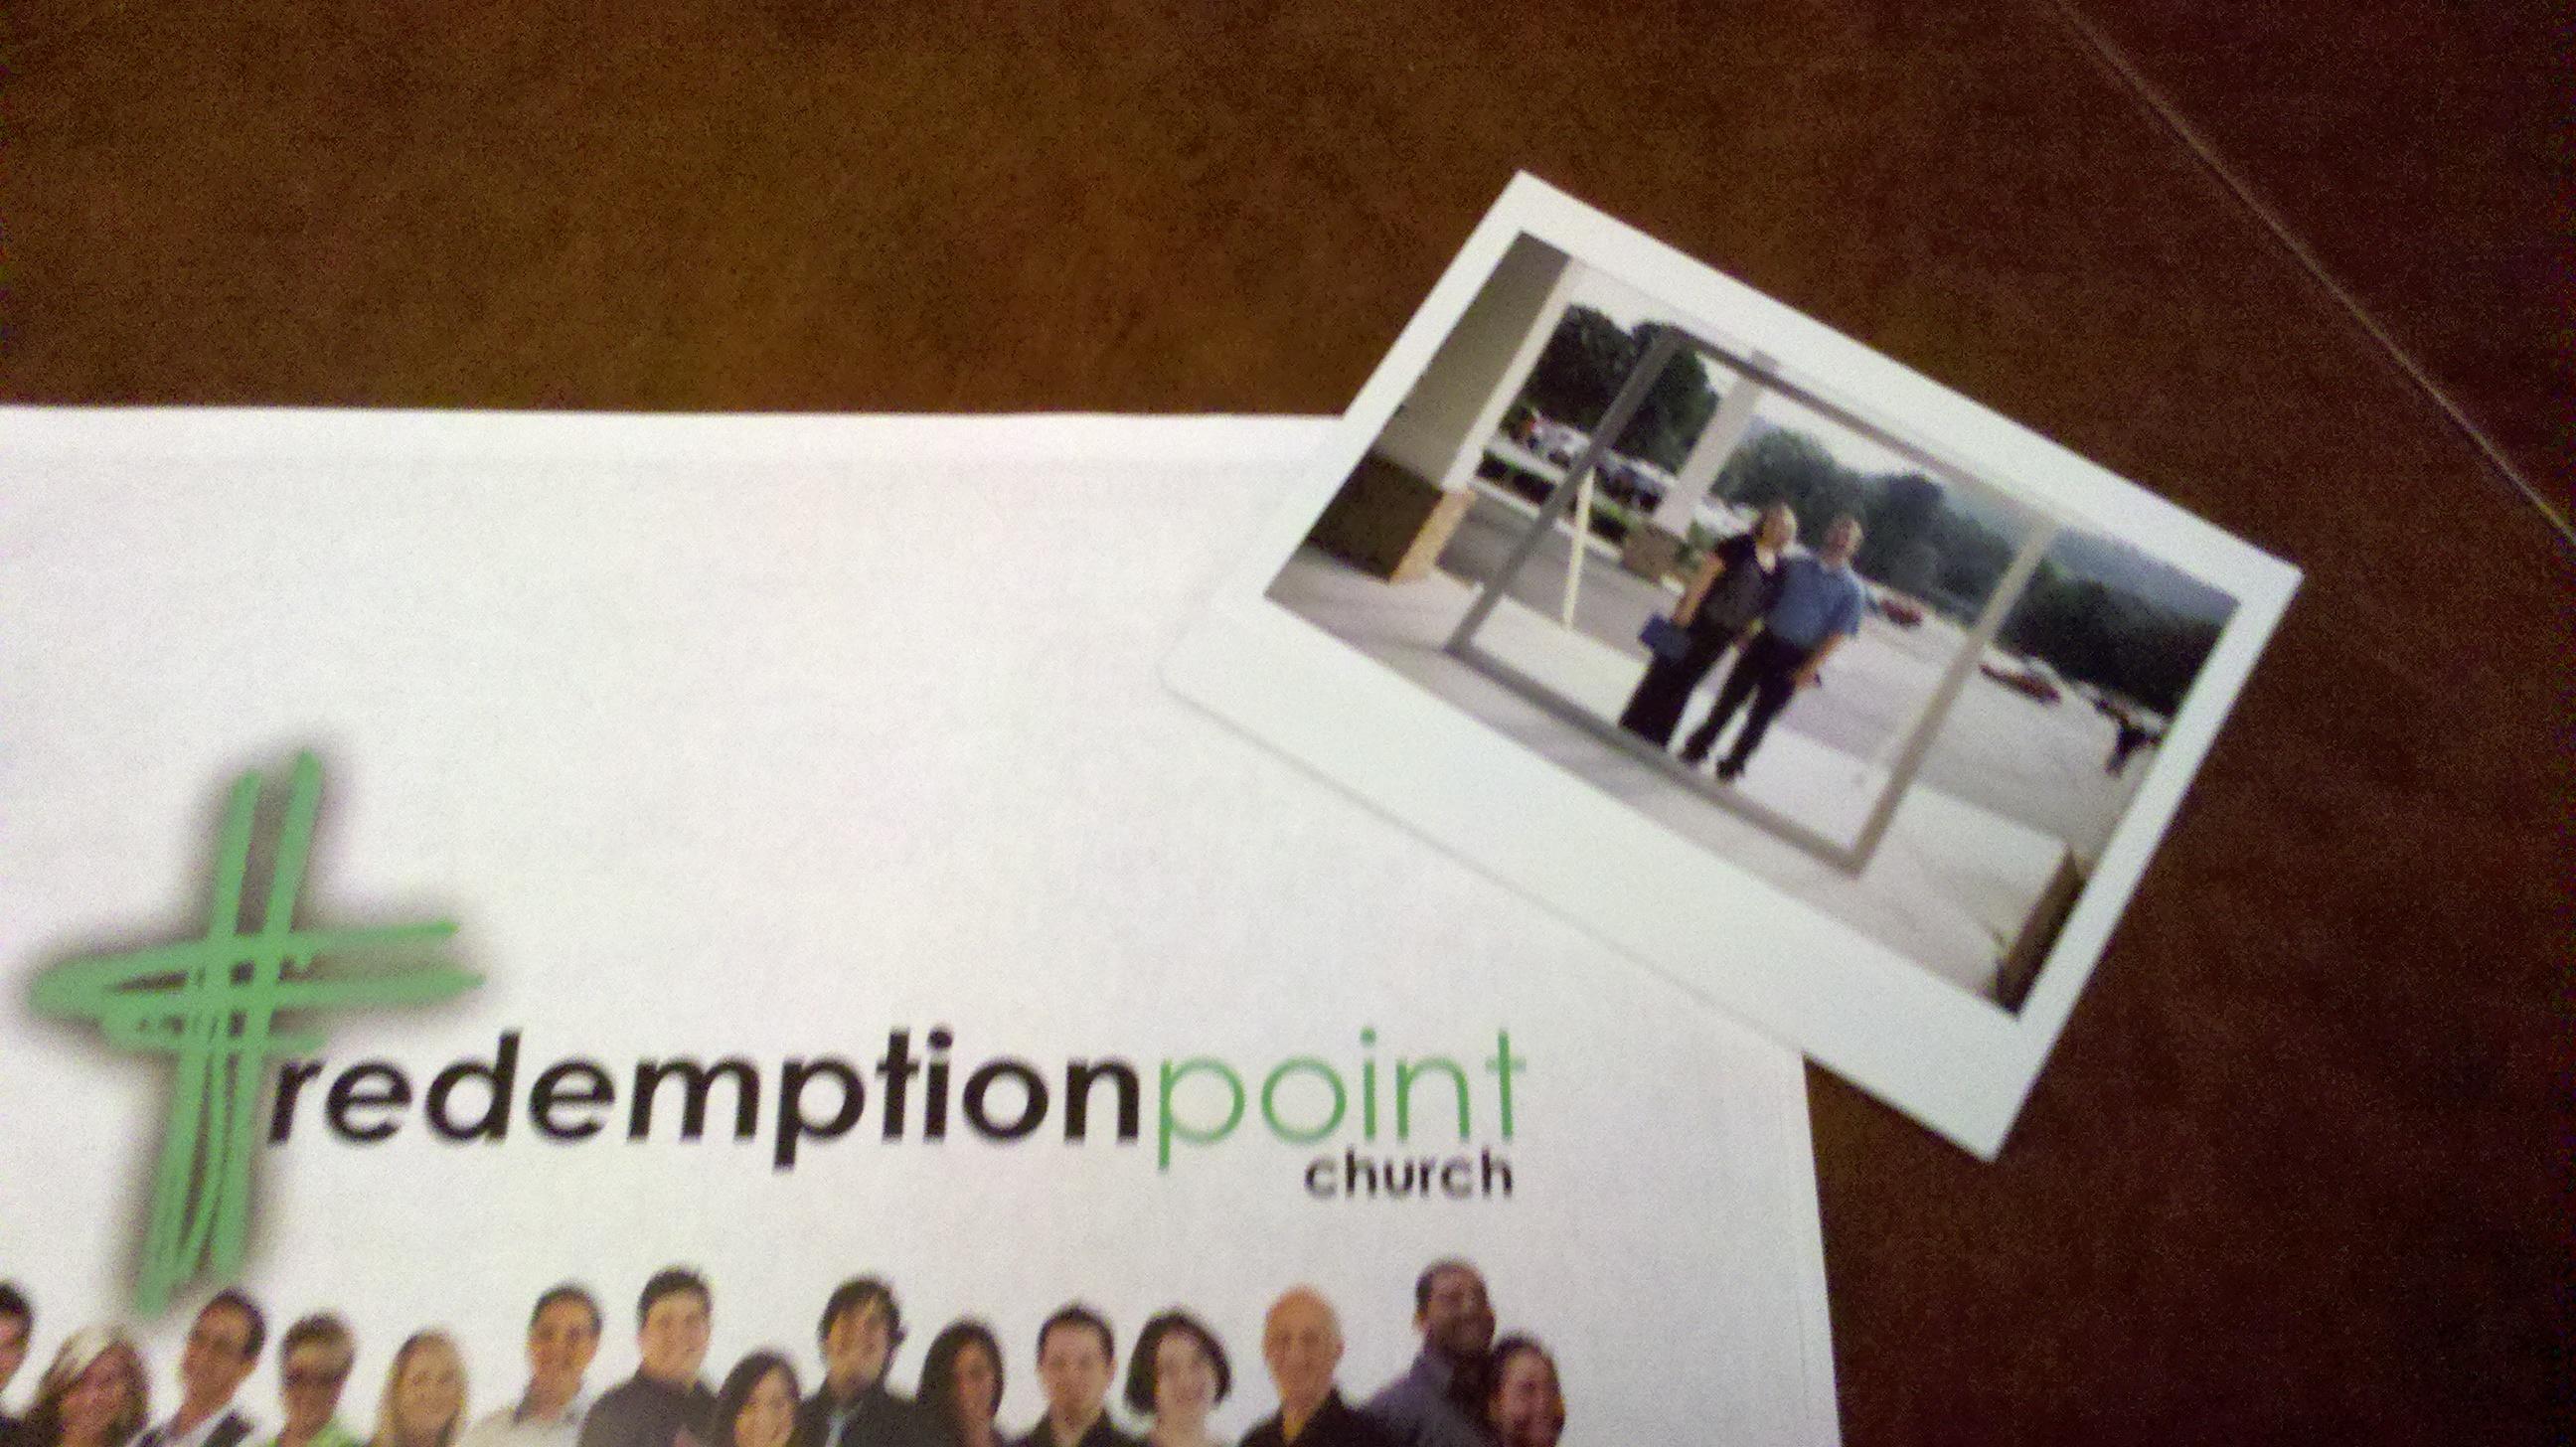 ChurchSurfer @ Redemption Point Church: A Charlie Brown Pentecostal